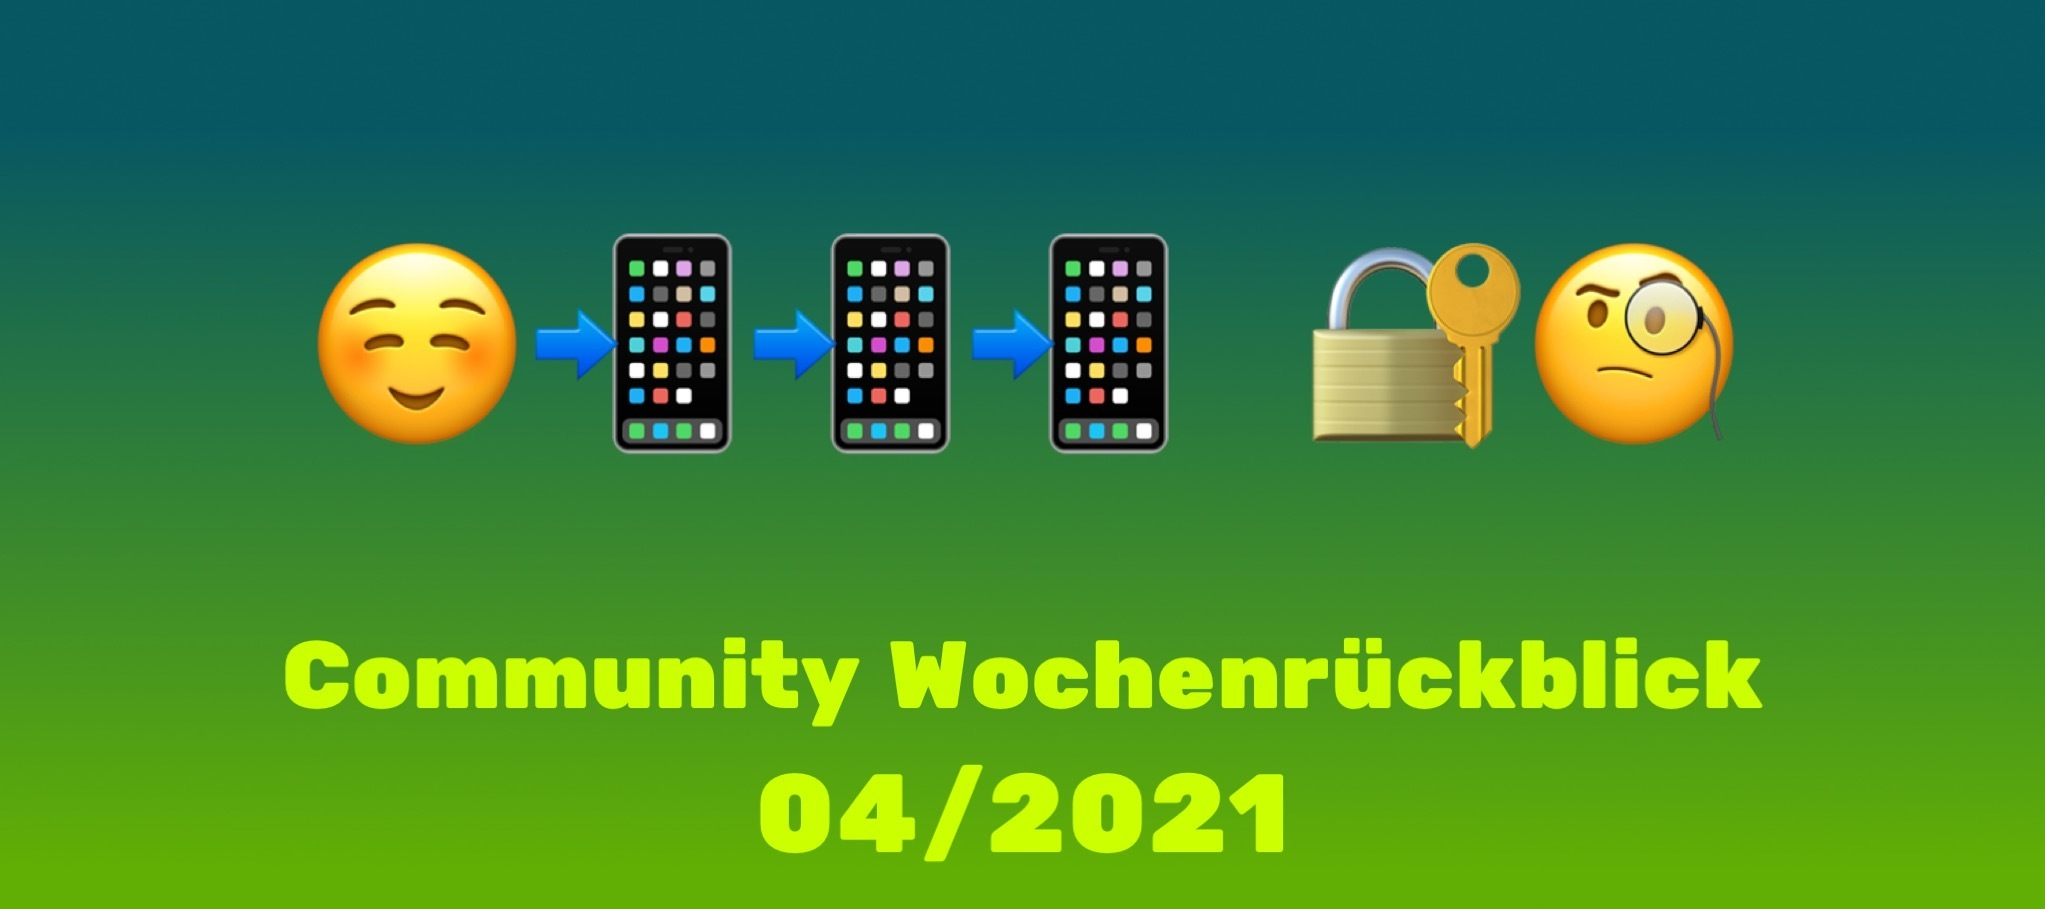 Community Wochenrückblick #4/2021